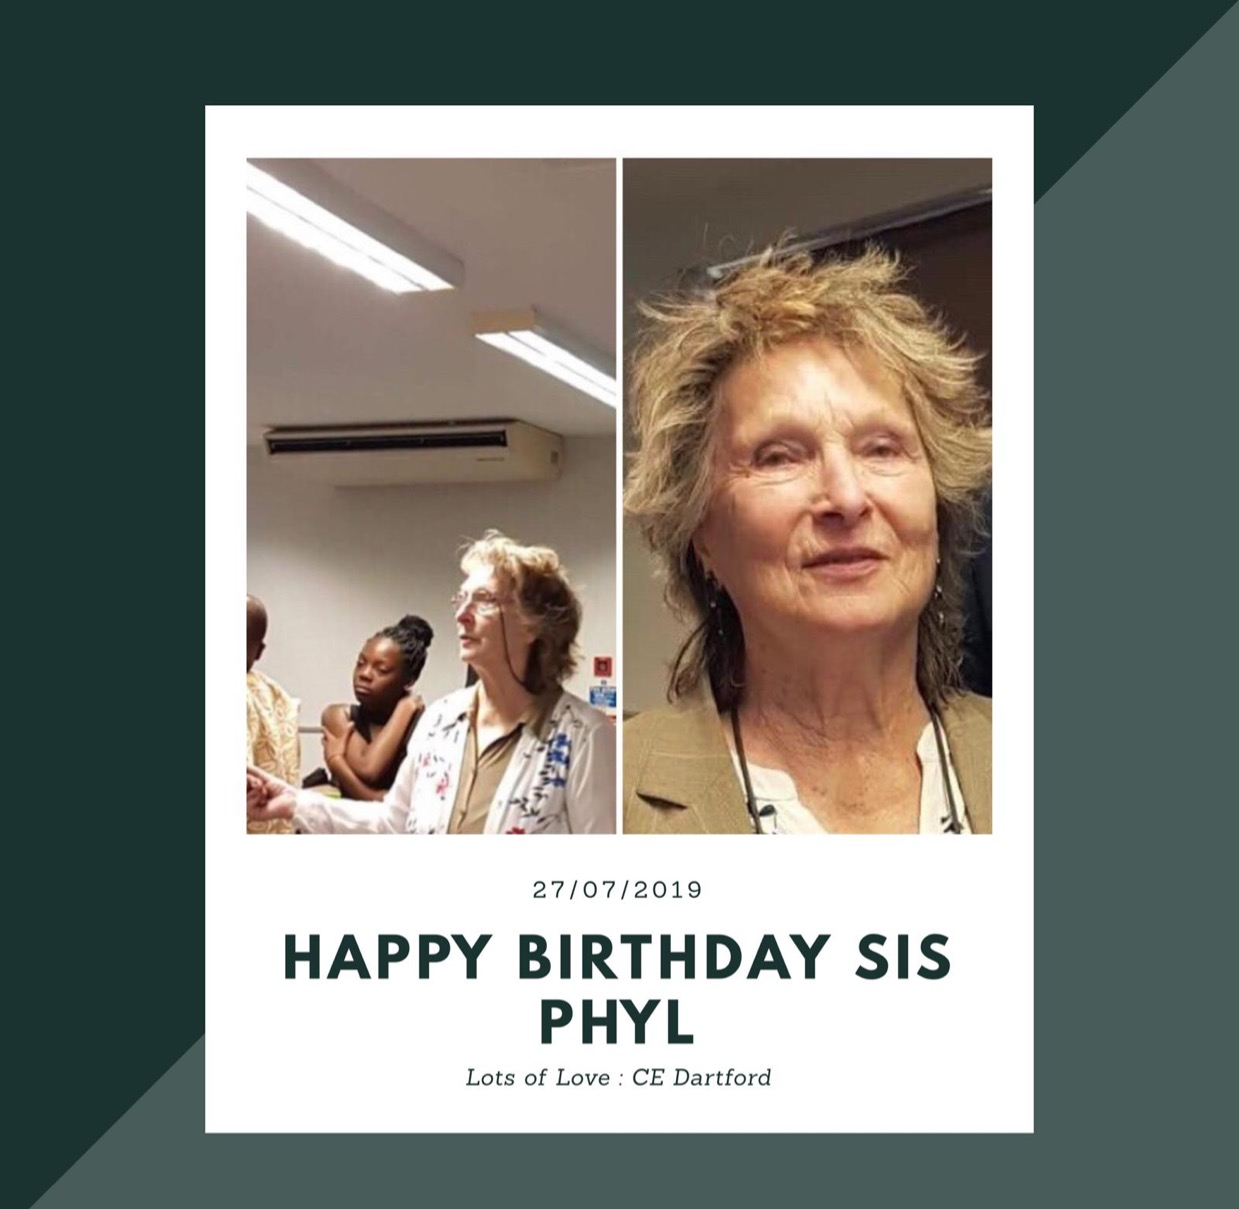 Happy birthday dearest Sis Phyl.